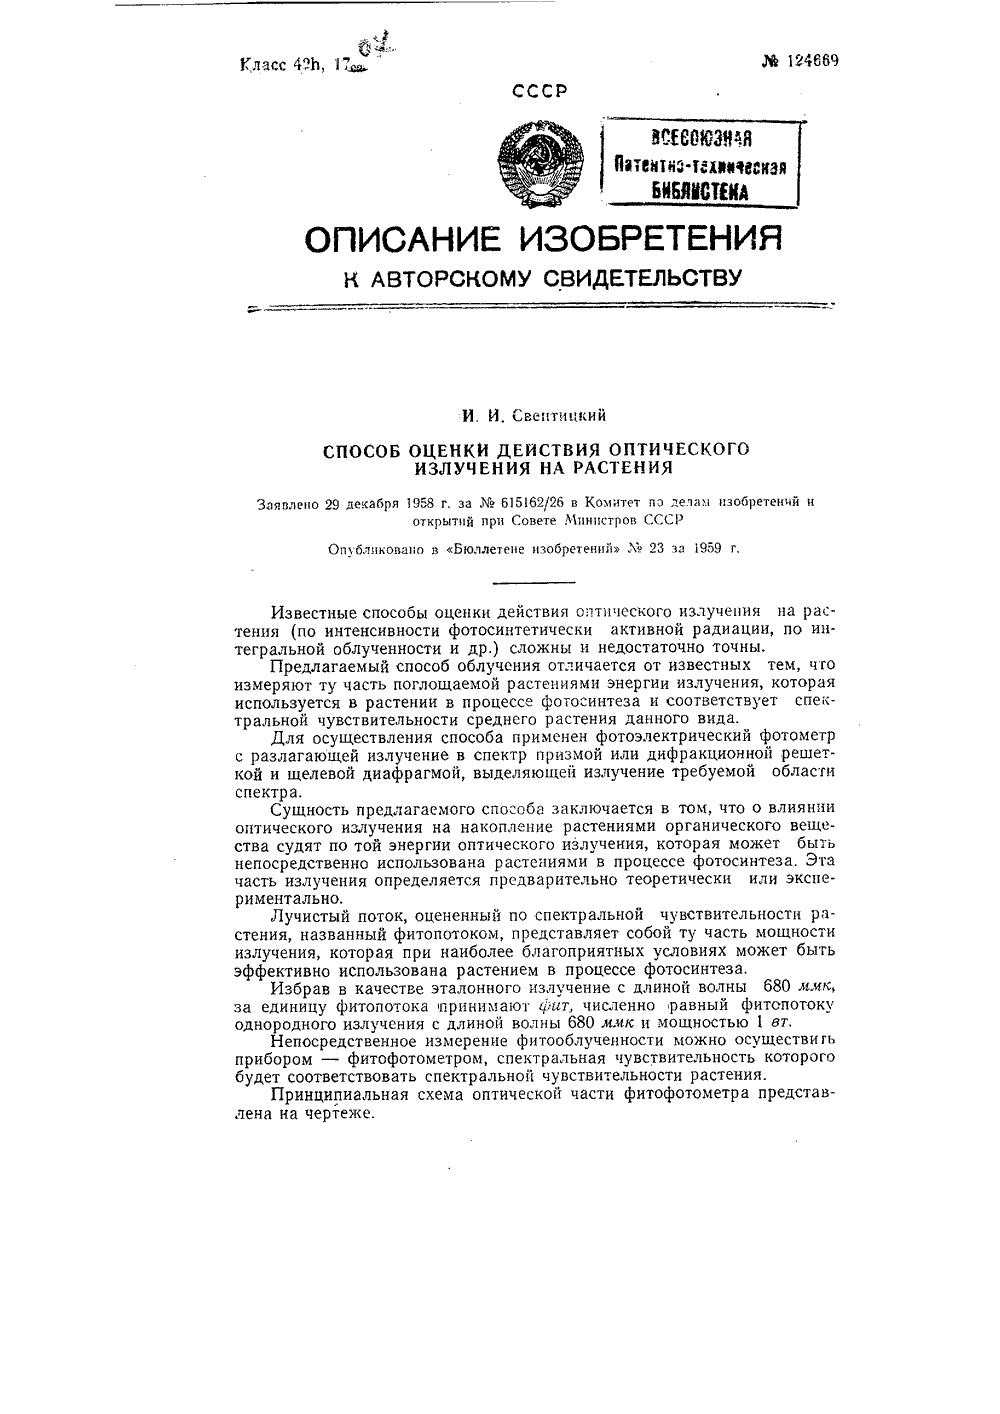 схема подключения mmr-313